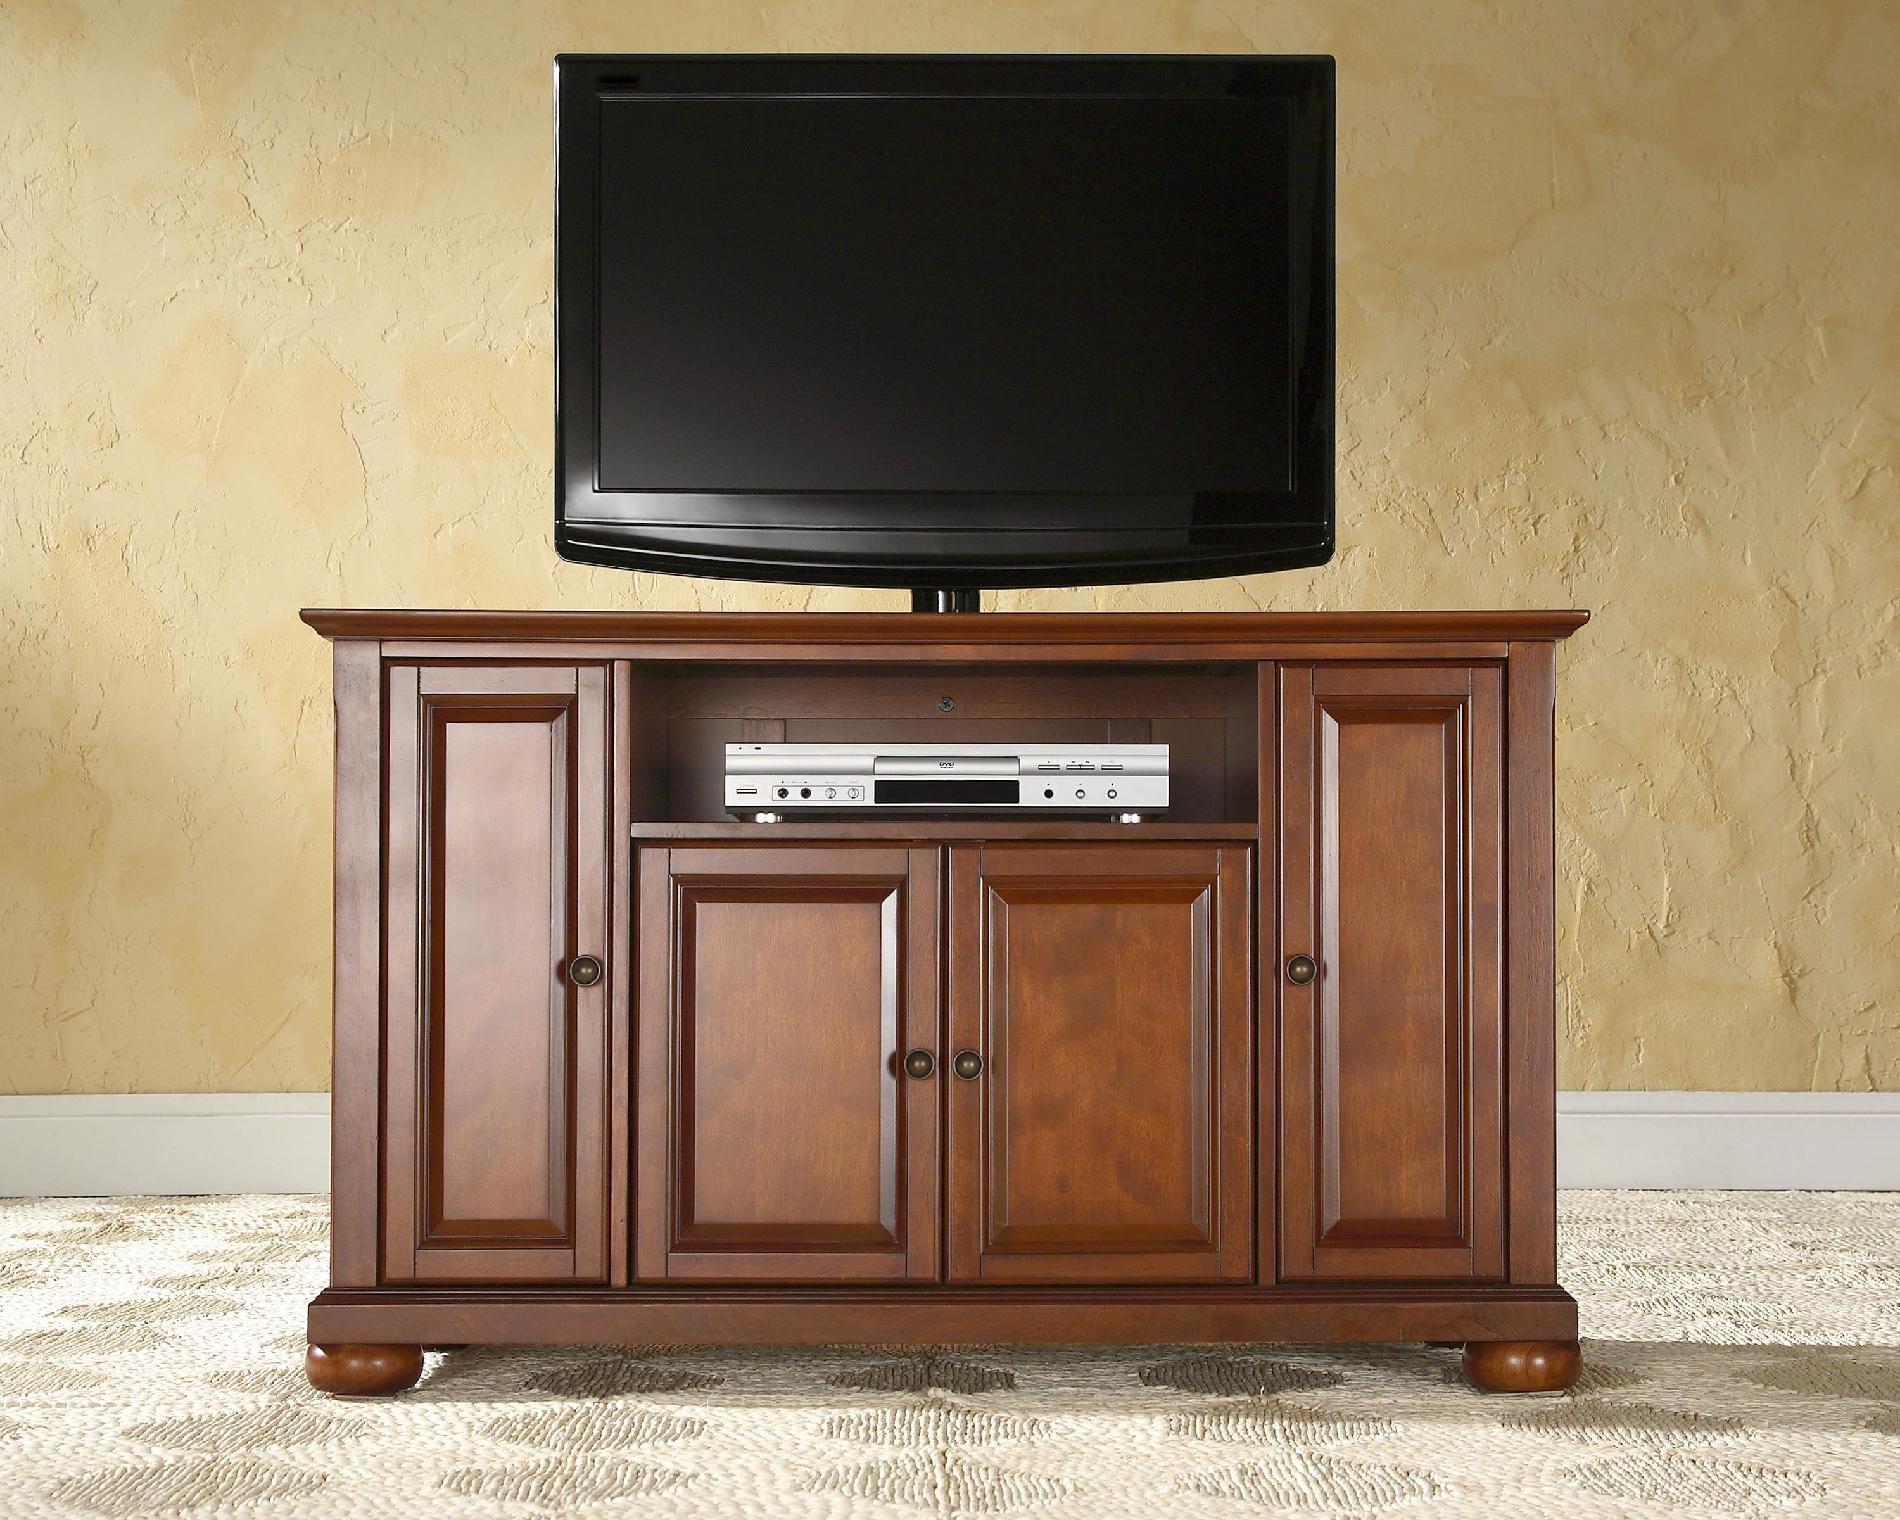 Crosley Furniture Alexandria 48in TV Stand in Classic Cherry